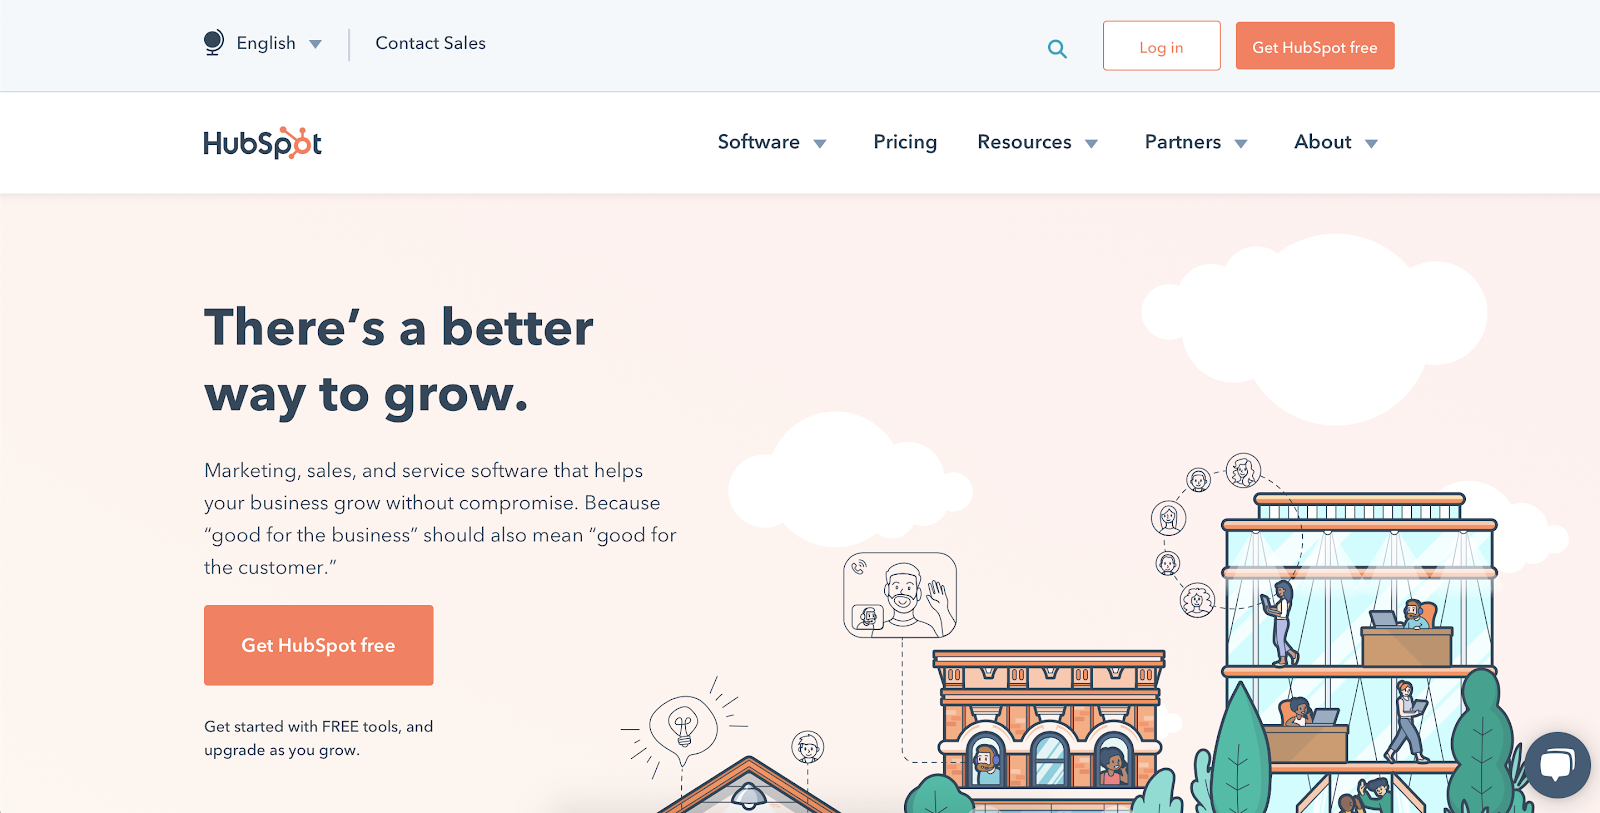 SaaS analytics tools: HubSpot